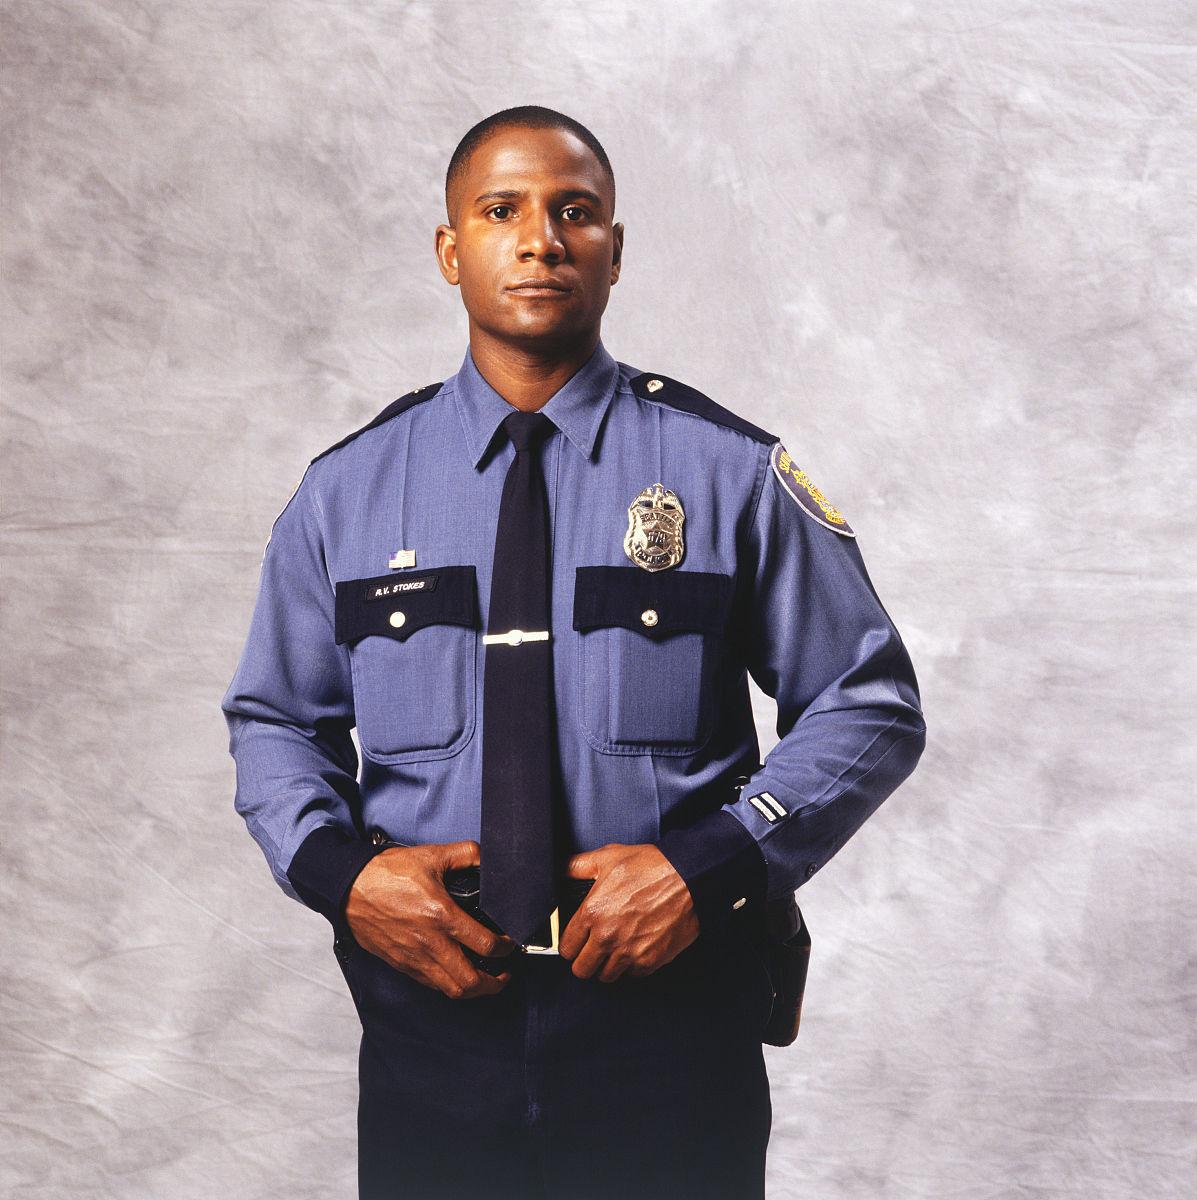 警官�y�-��+_警察,(肖像)